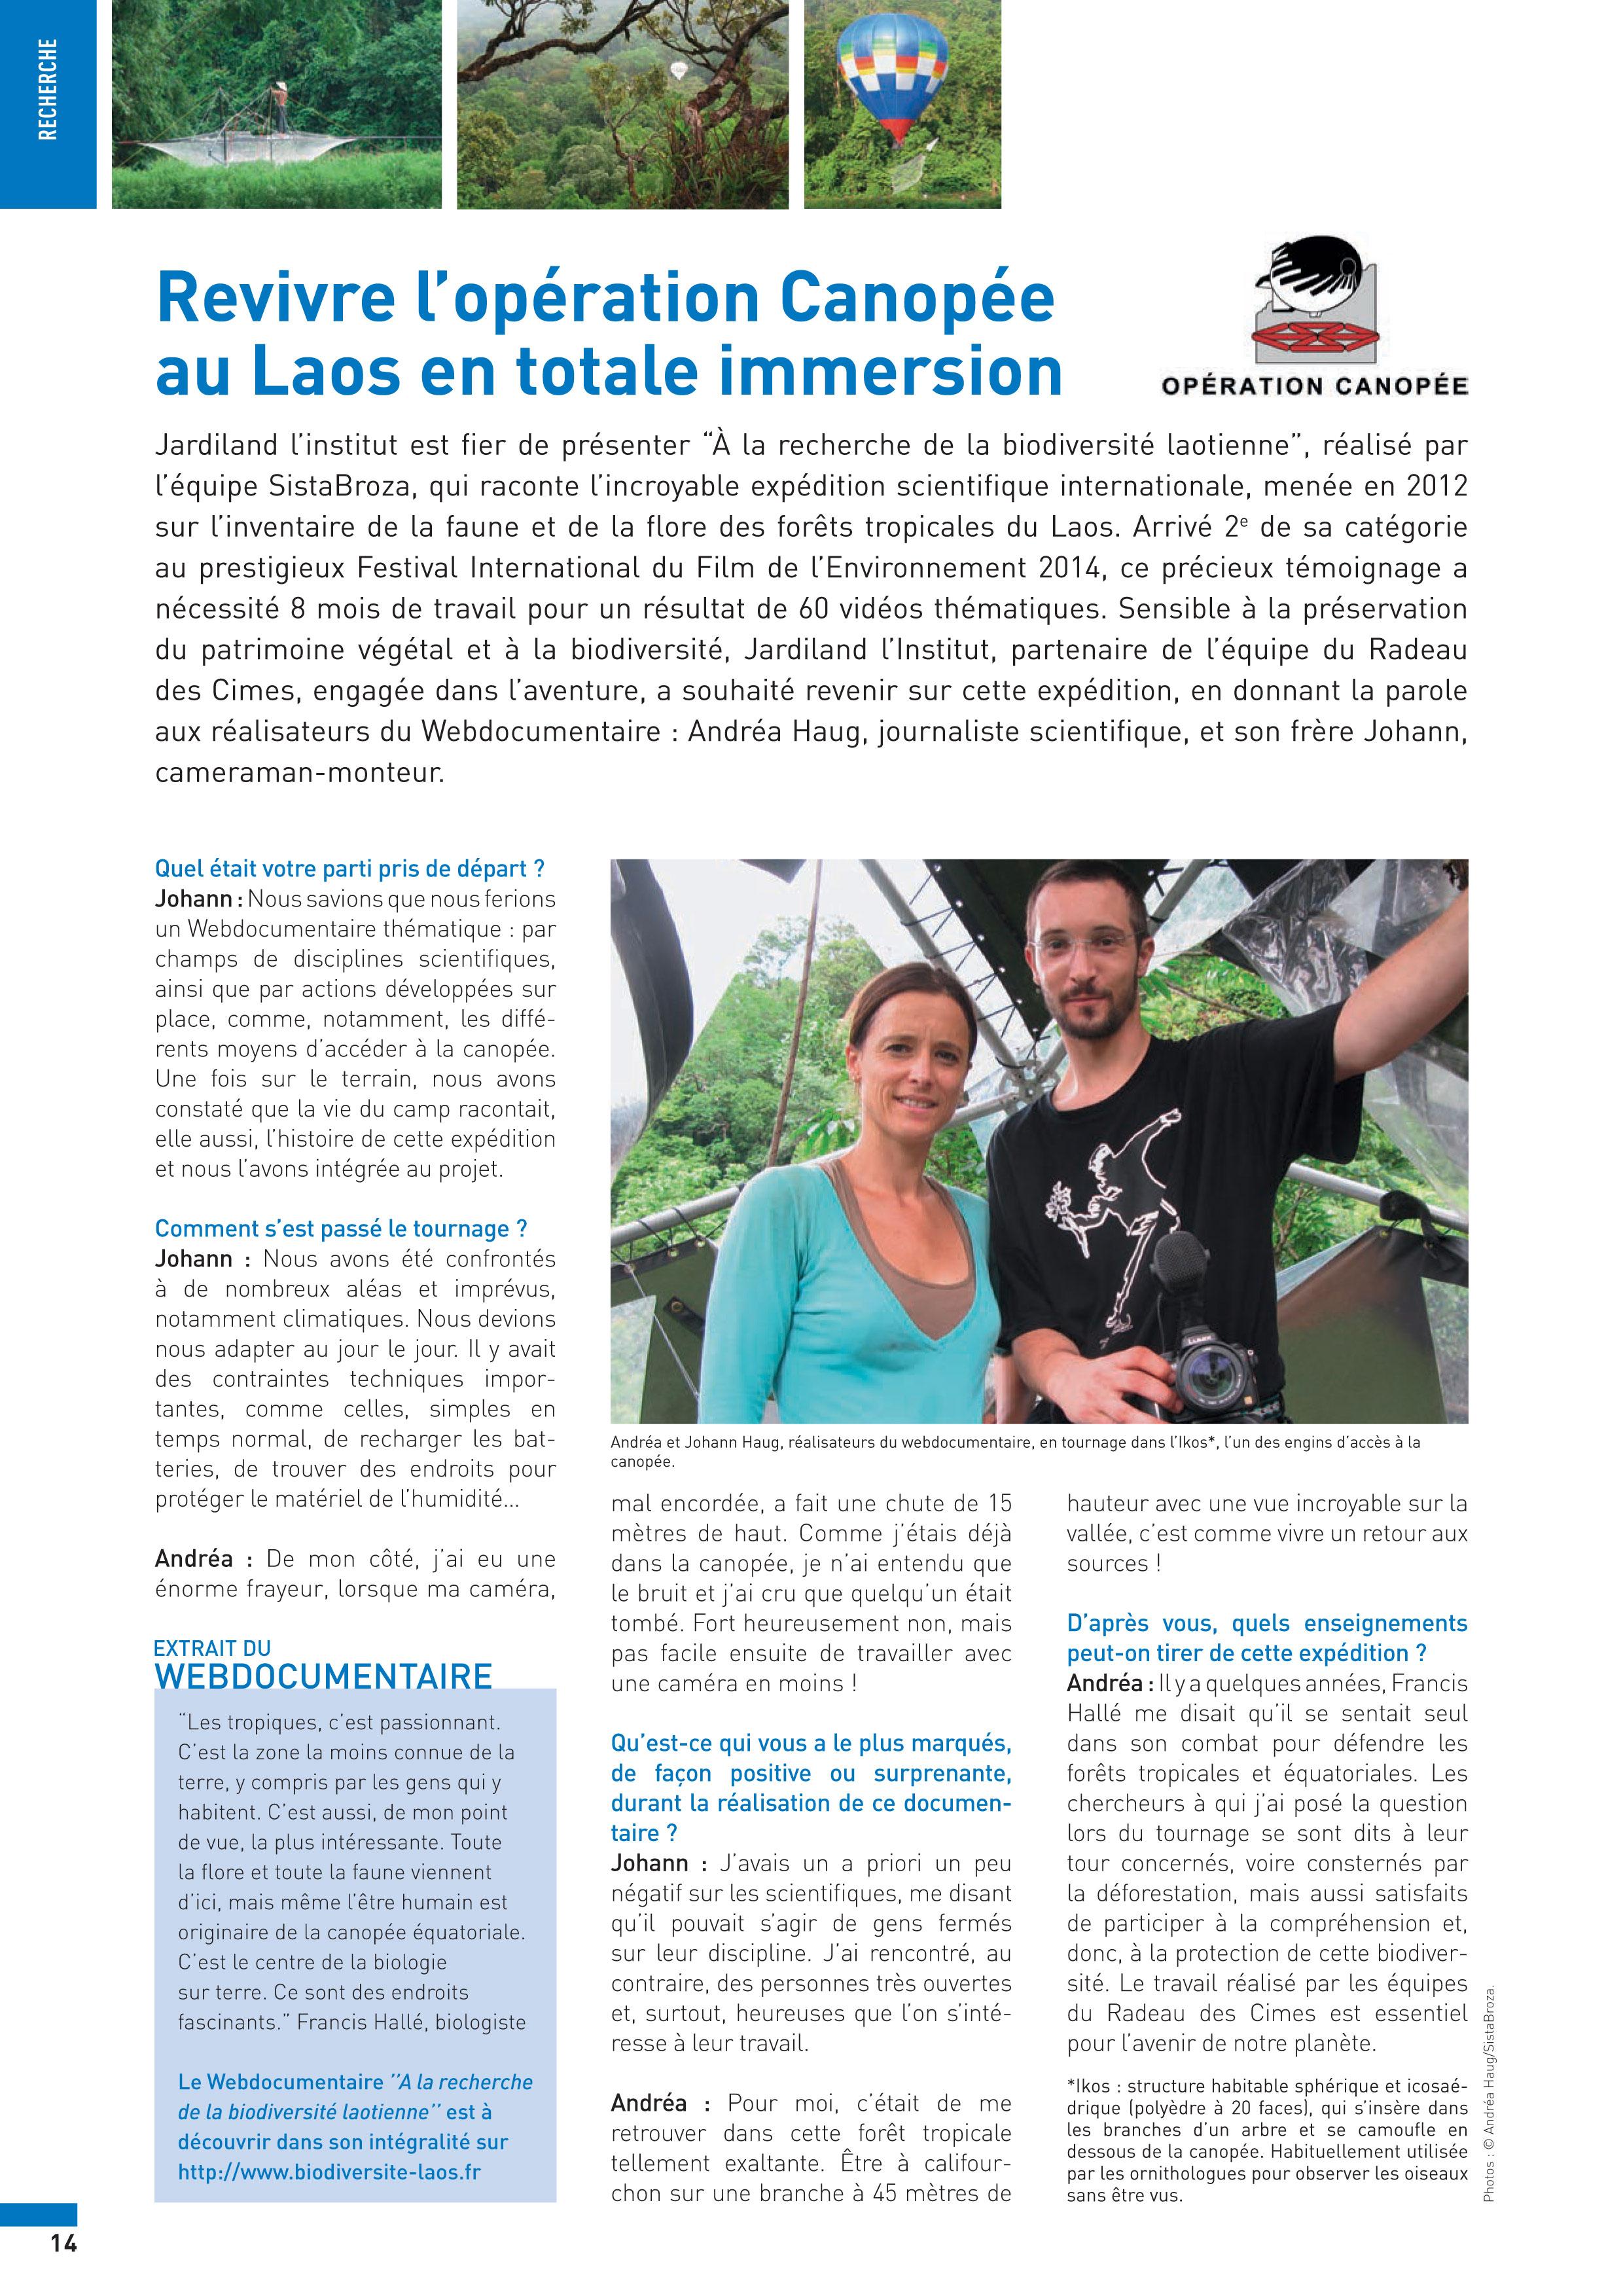 3-itw-andrea-et-johann-haug-dans-news-institut-juin2014-SD